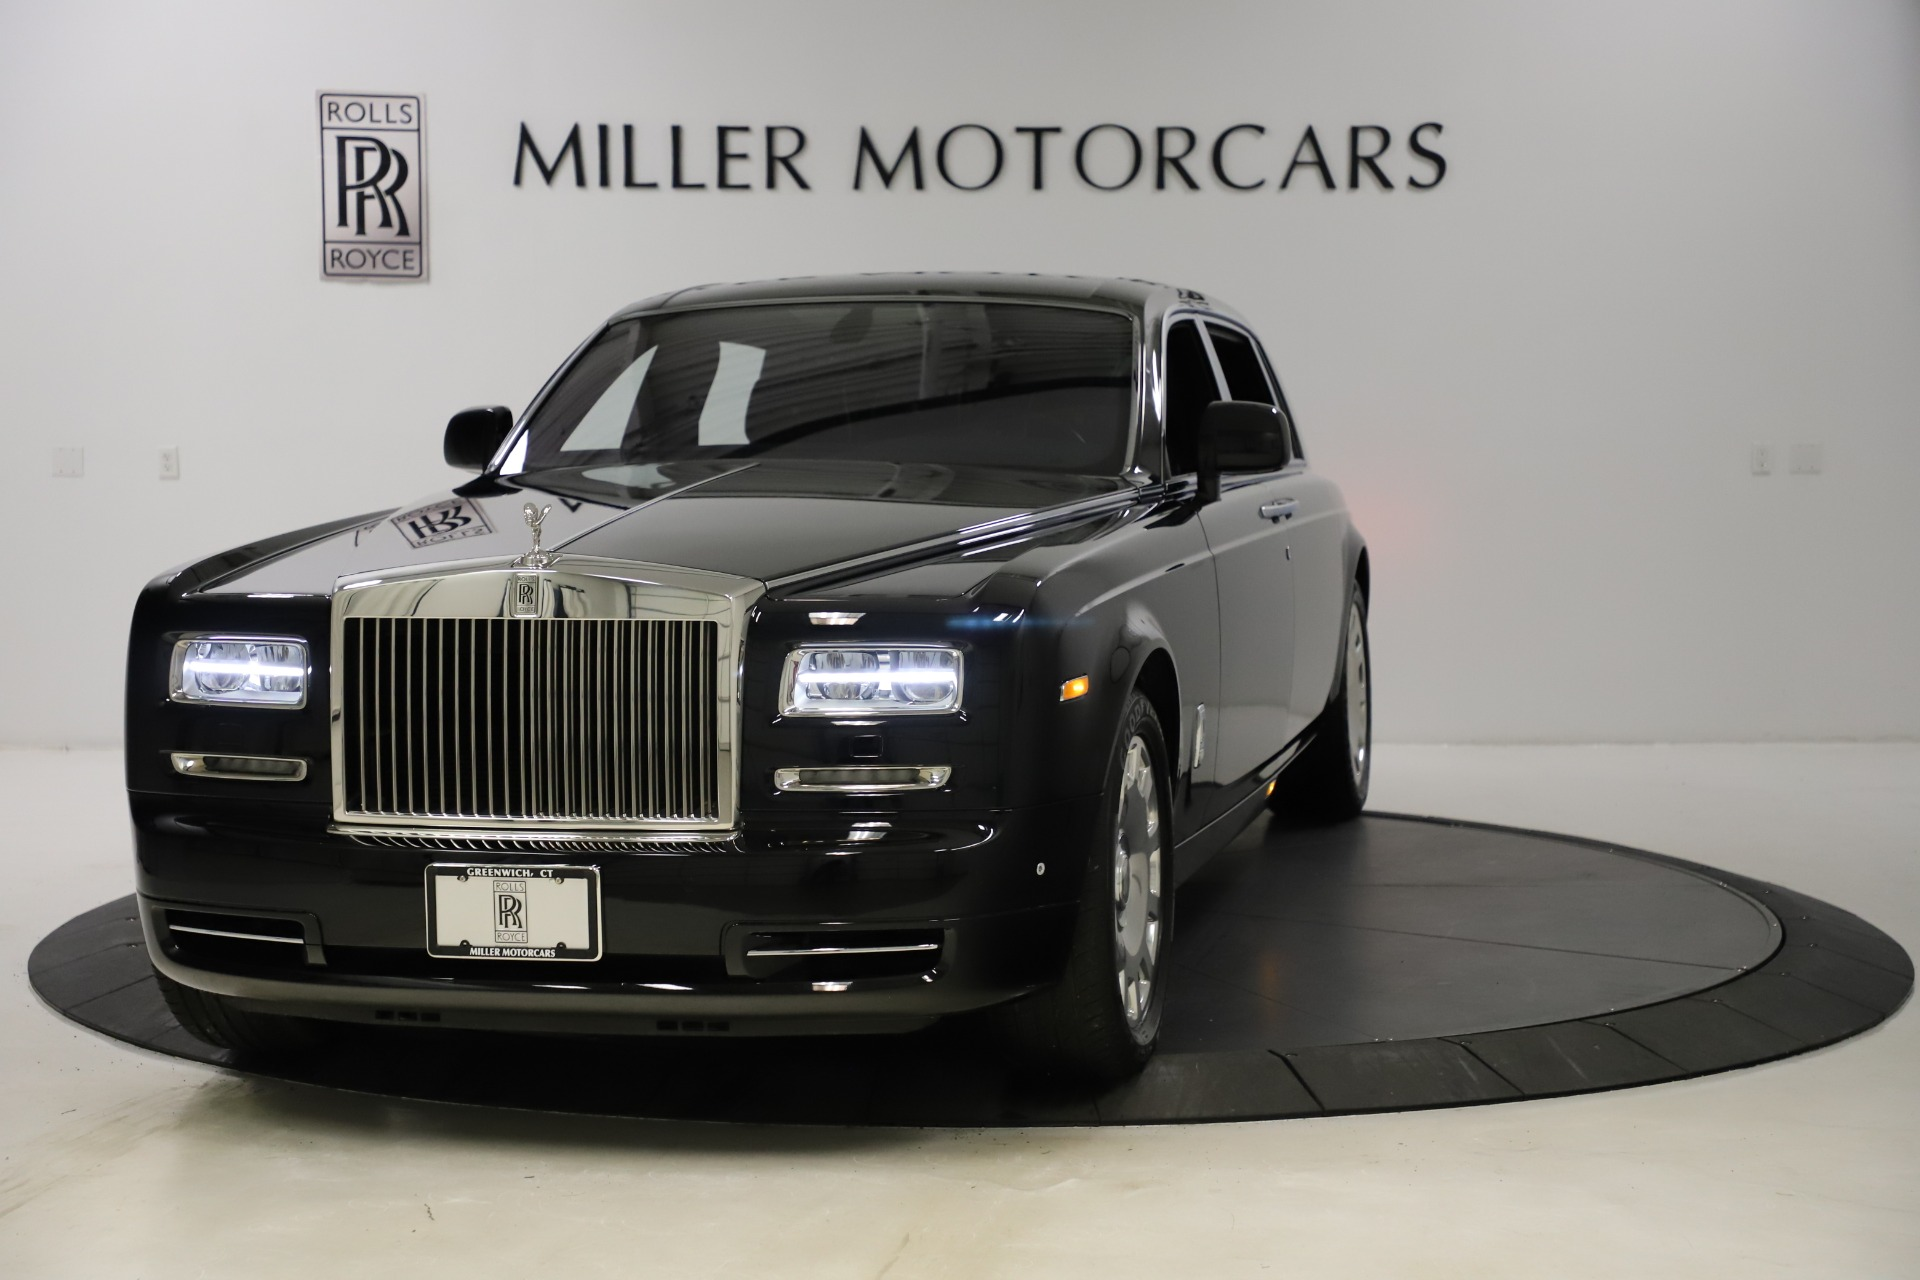 Used 2015 Rolls-Royce Phantom EWB for sale $289,900 at Bentley Greenwich in Greenwich CT 06830 1